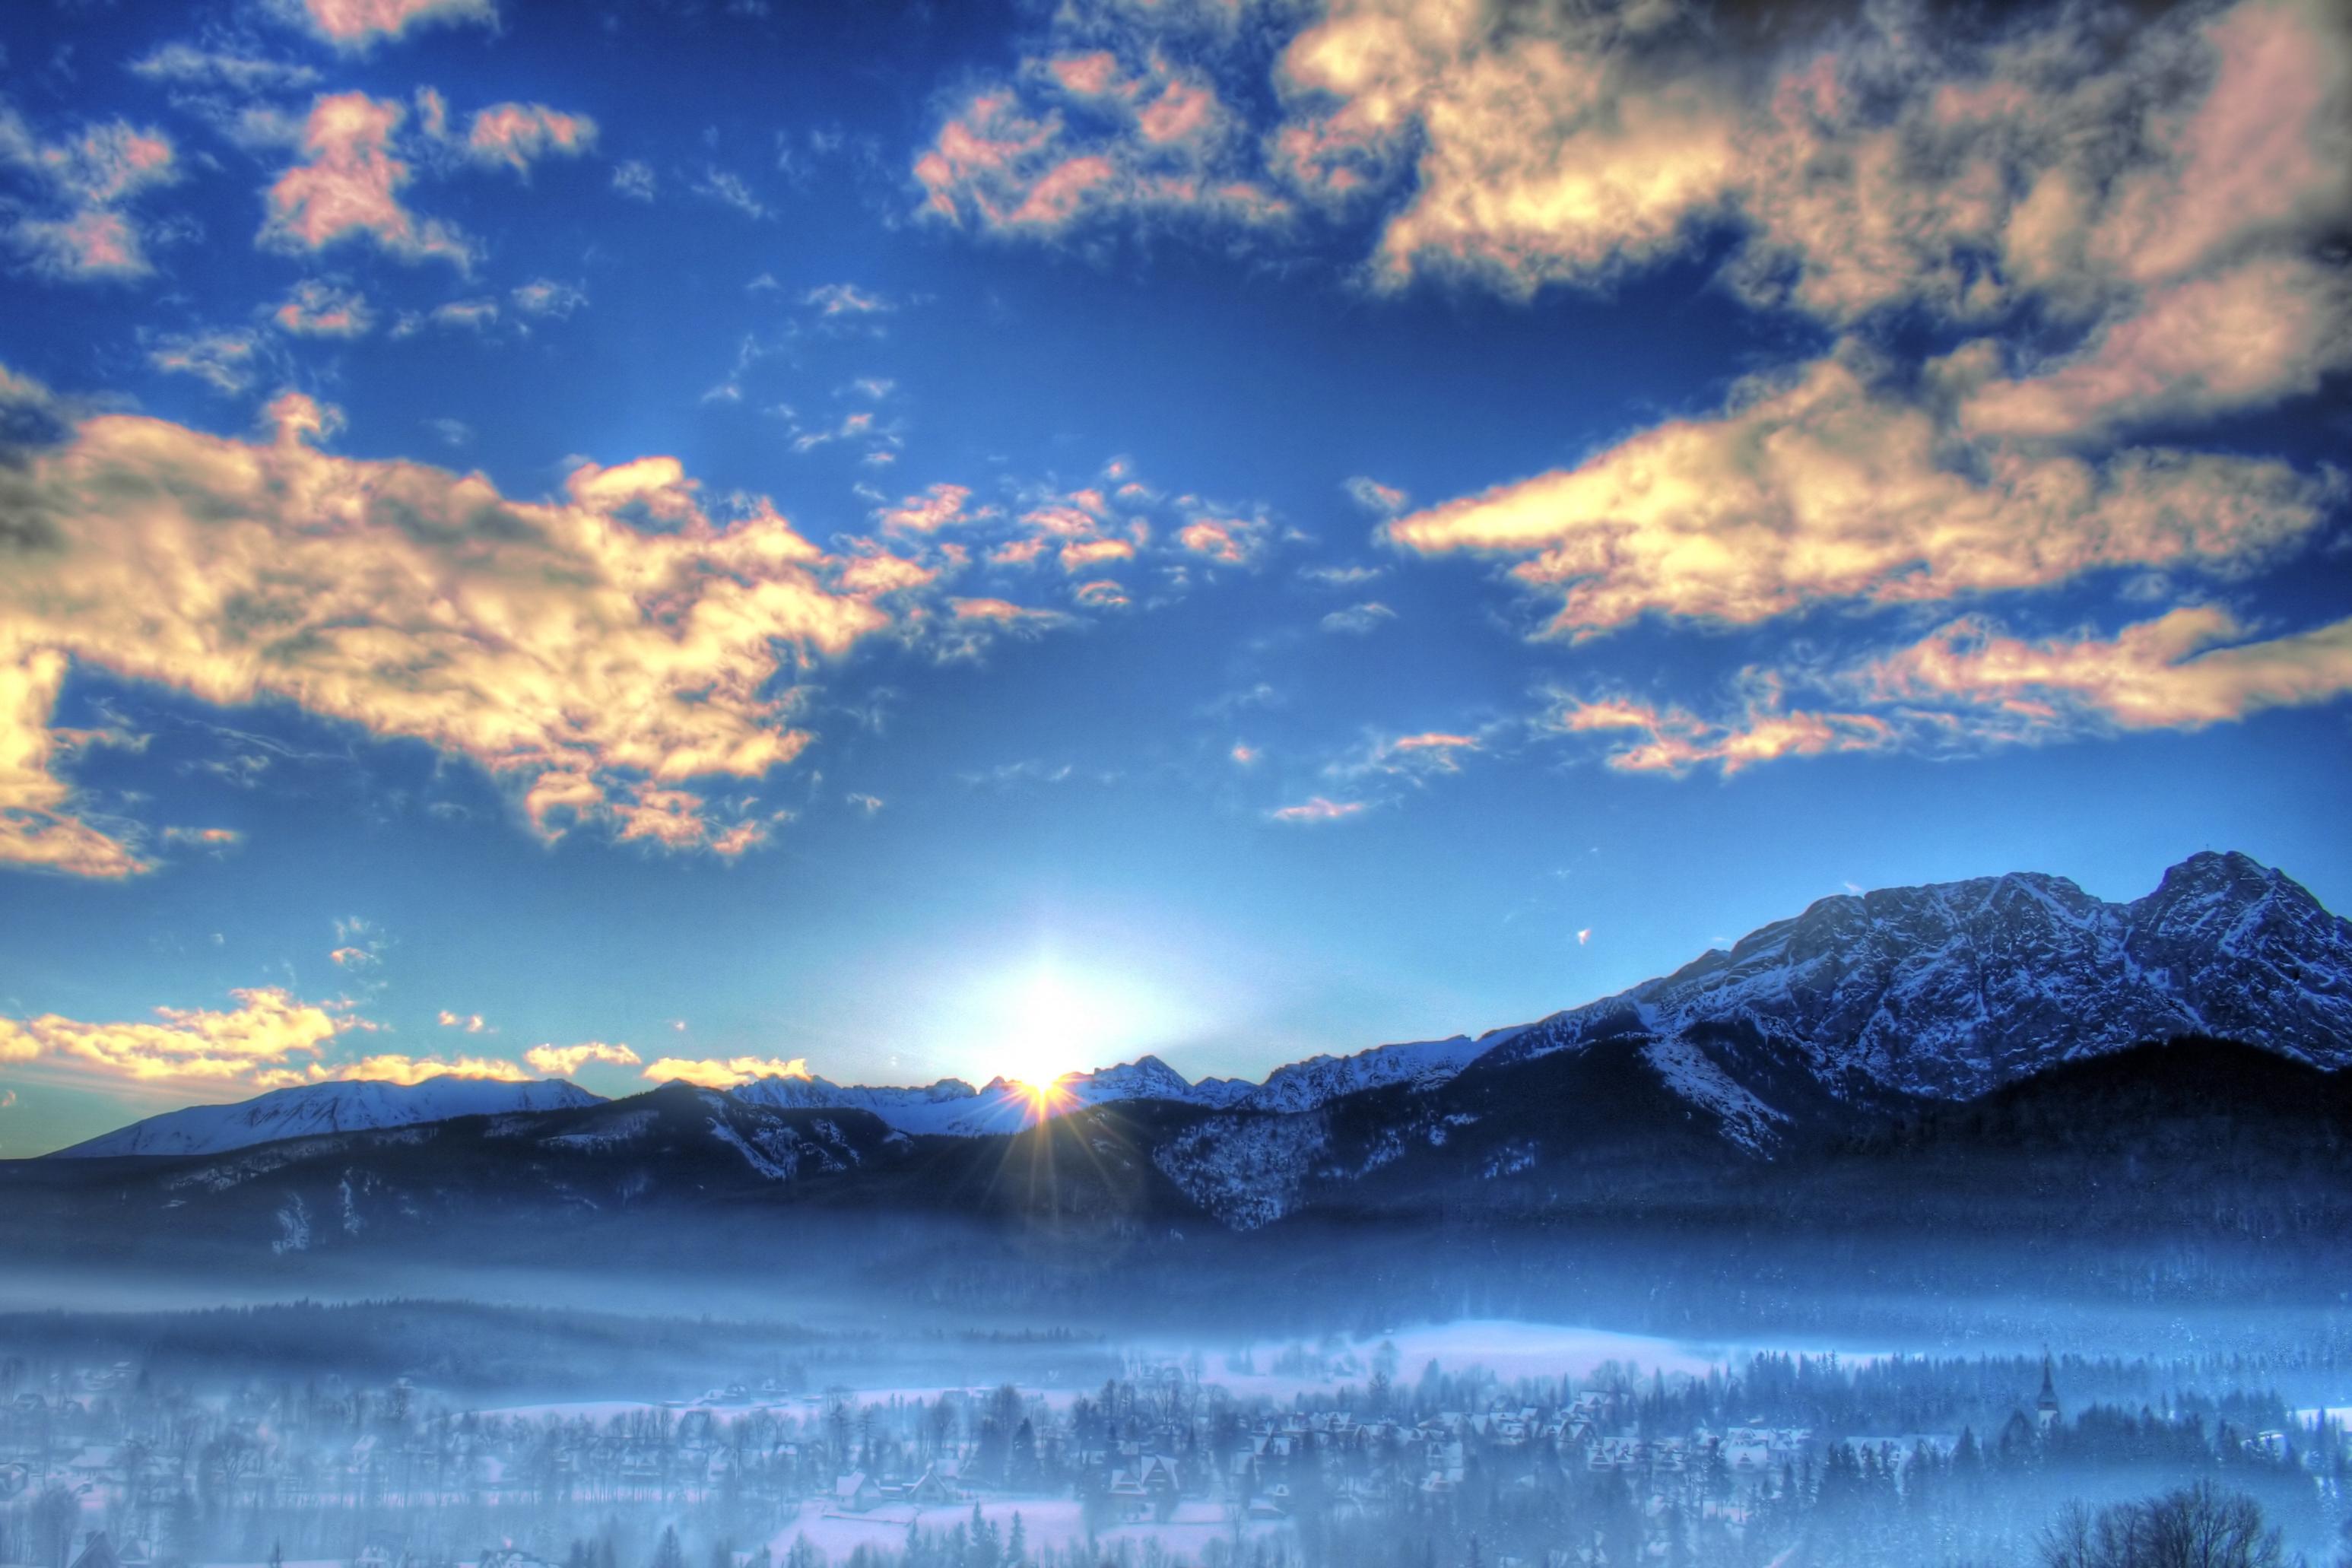 Image Source Page: http://val-shevchenko.deviantart.com/art/Winter ...